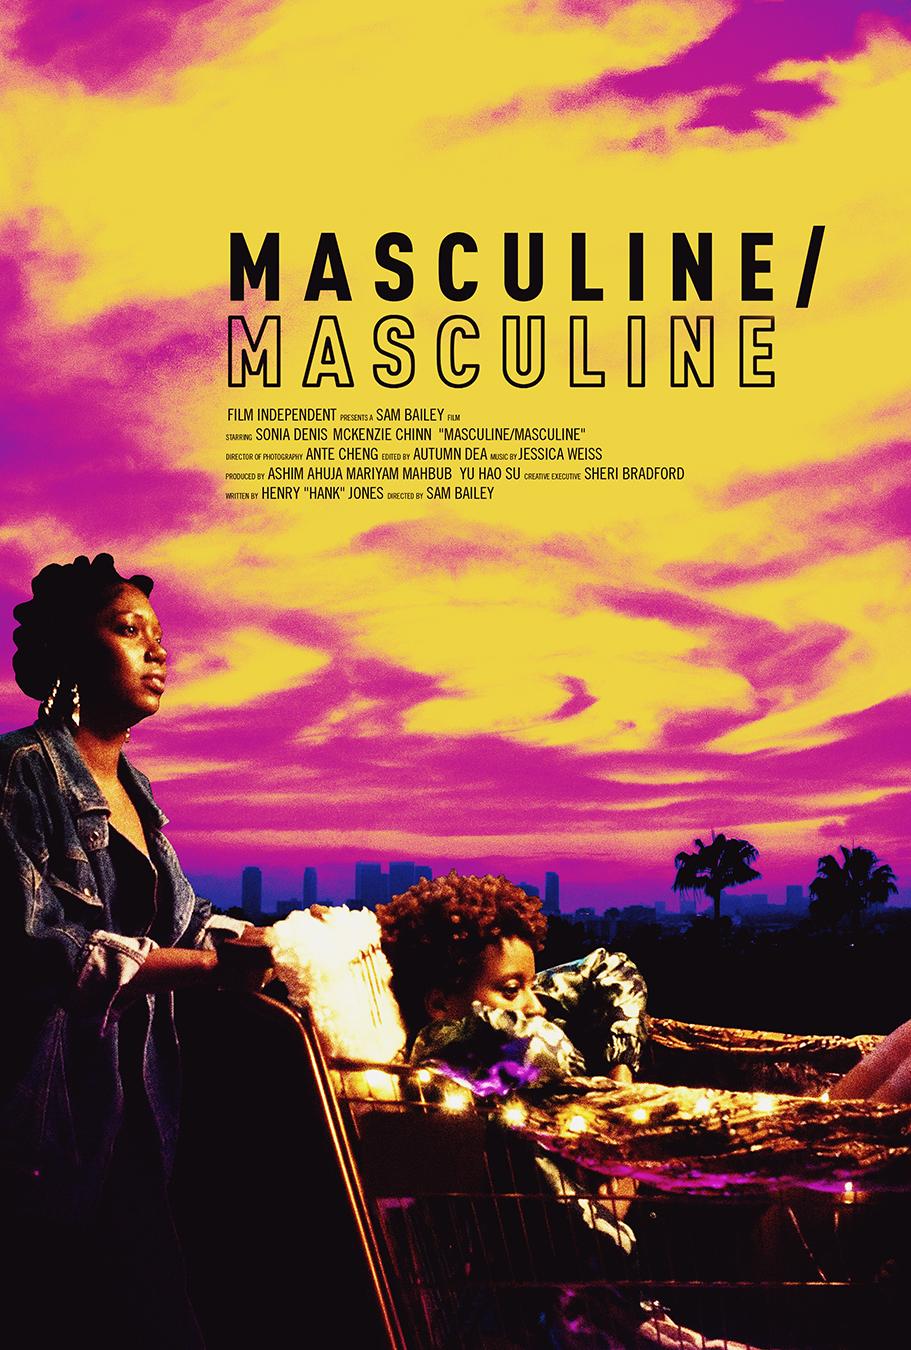 MasculineMasculine_Update.jpg